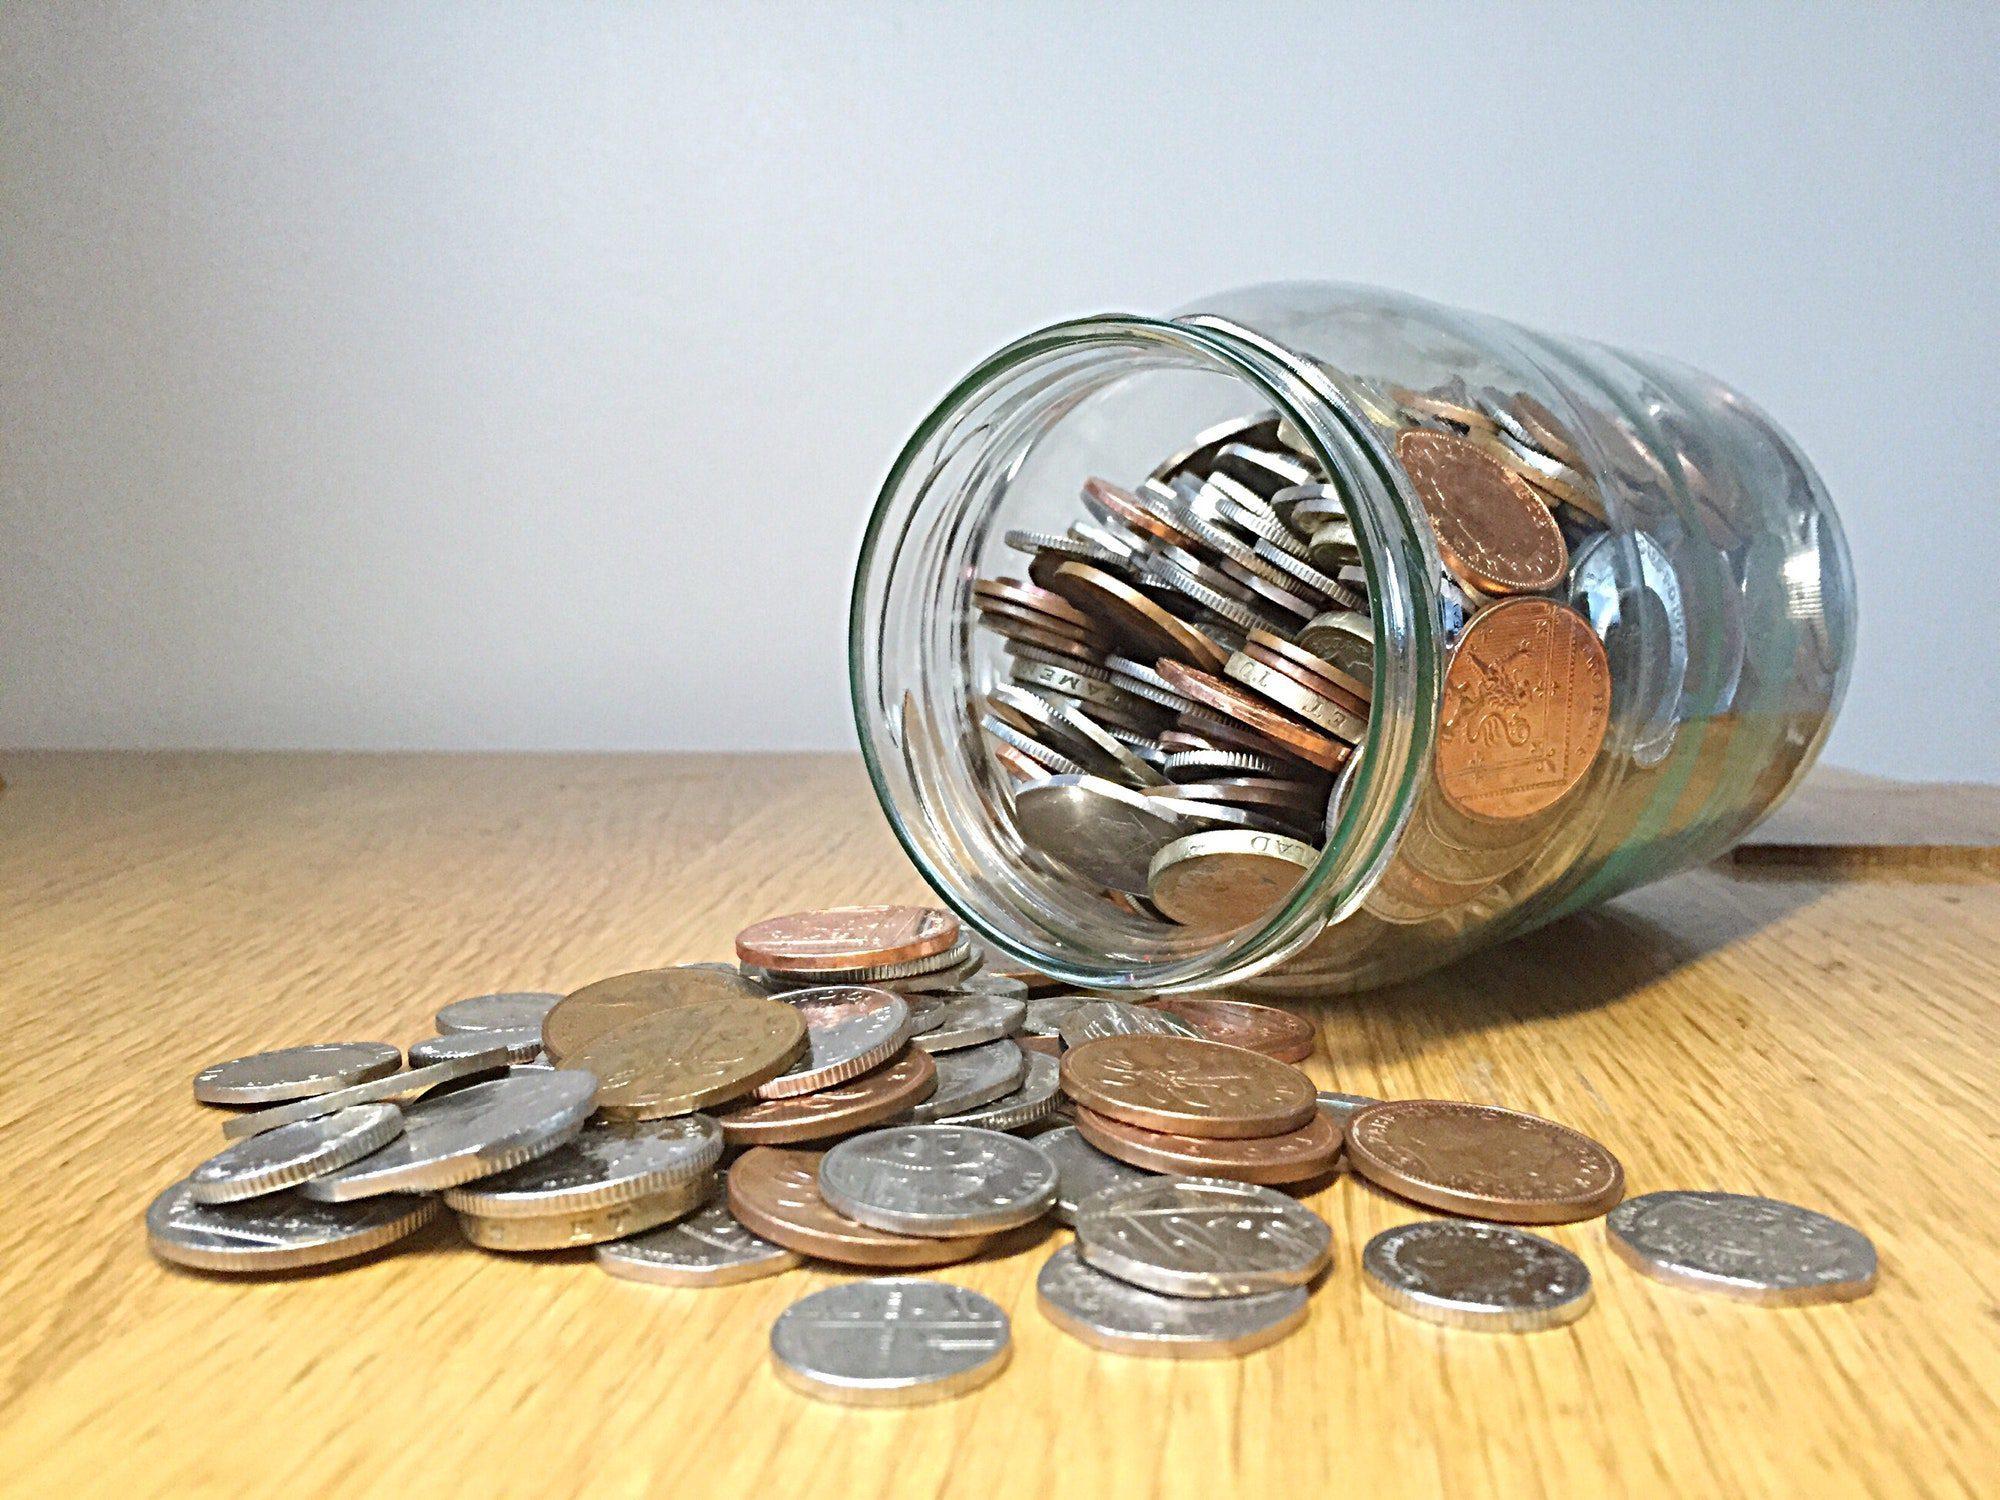 Money in the jar , coins, savings